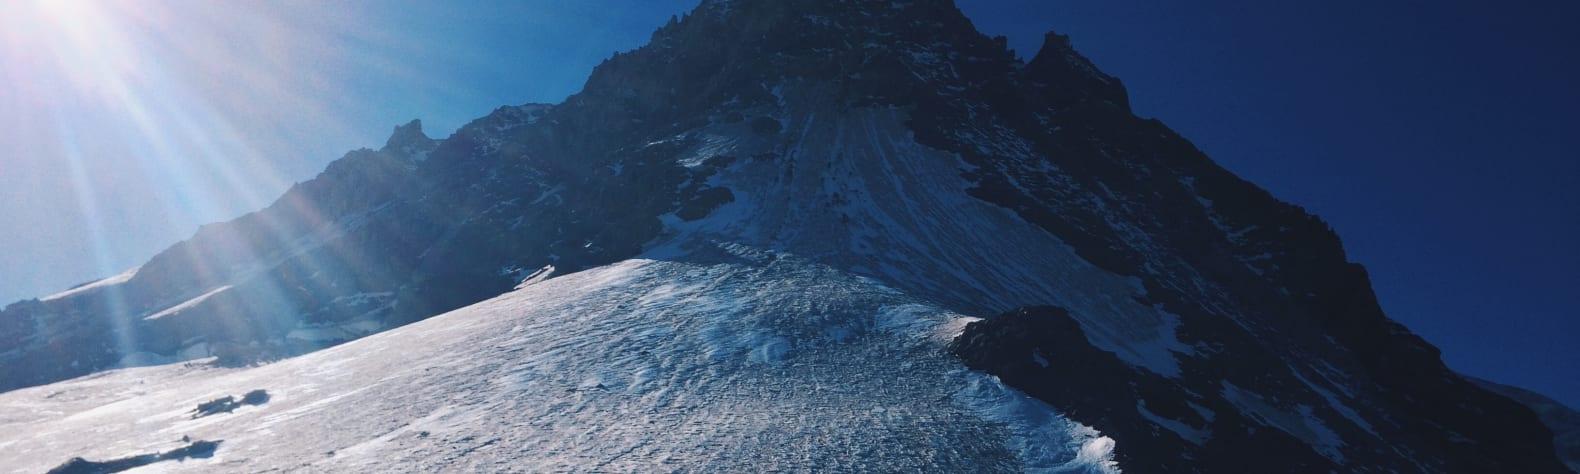 Mt. Hood National Forest